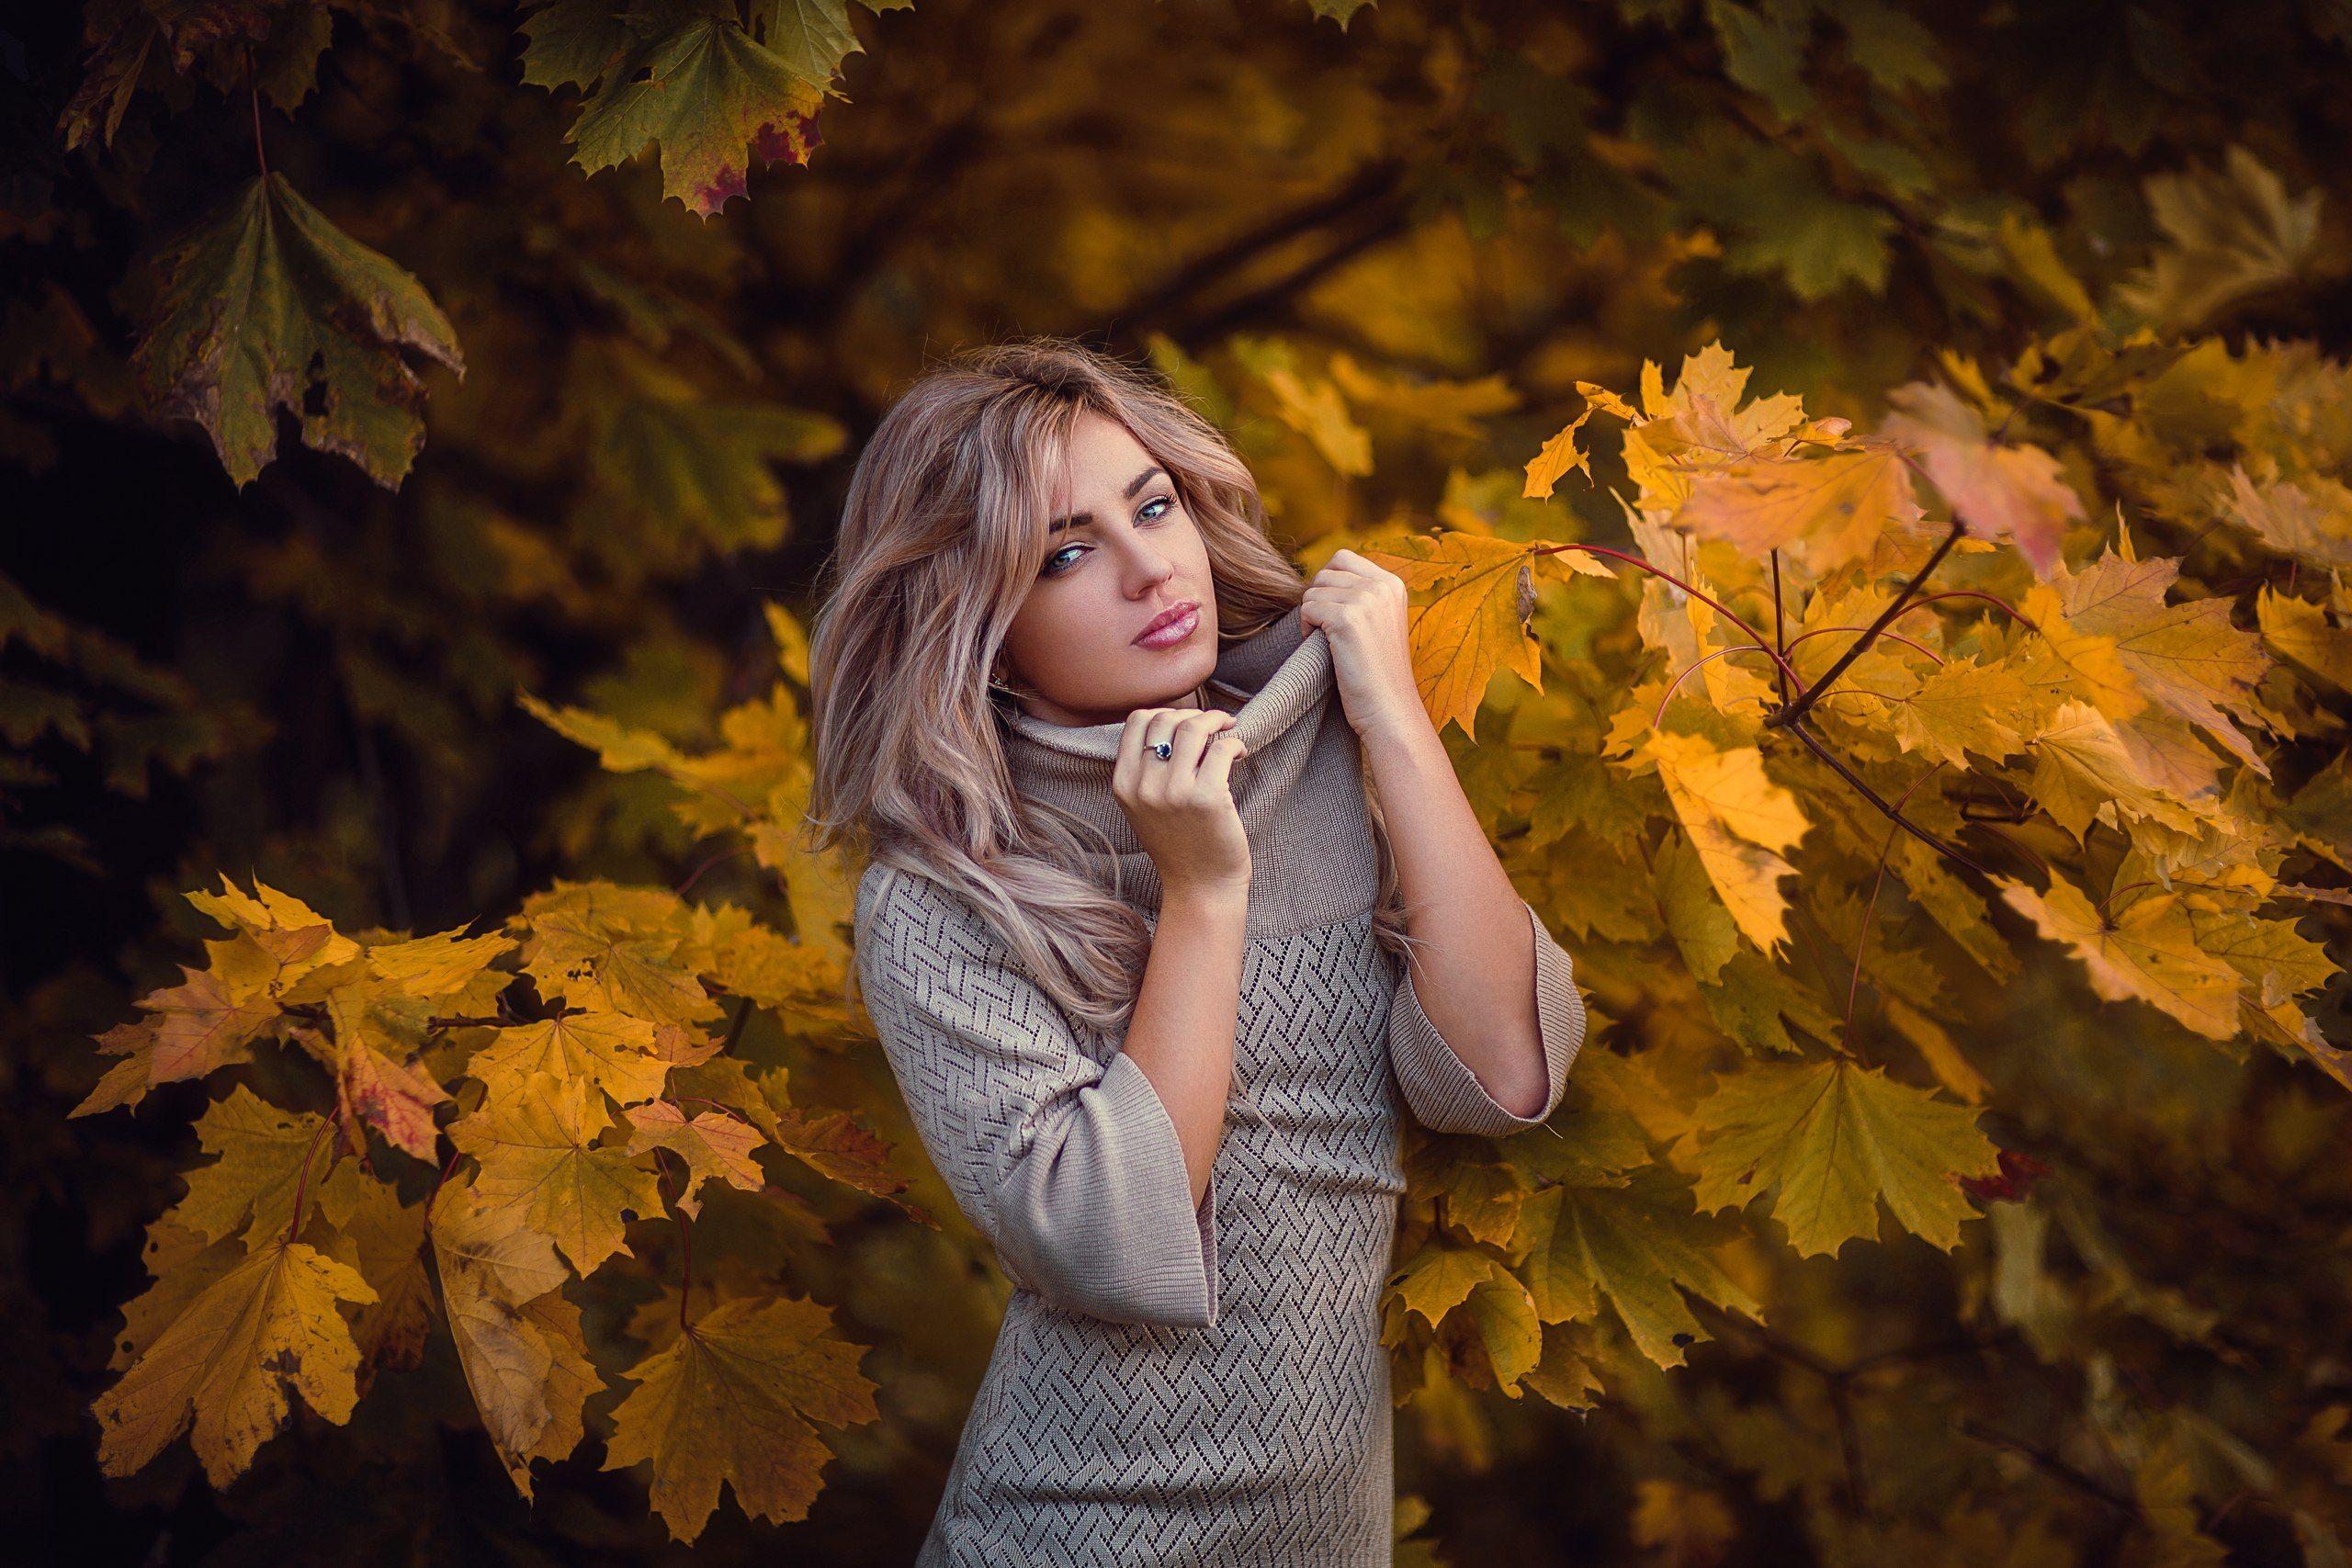 #portrait #beautiful #model #russia #moscow # #canon #sigma #sun #natural #light, Hakan Erenler